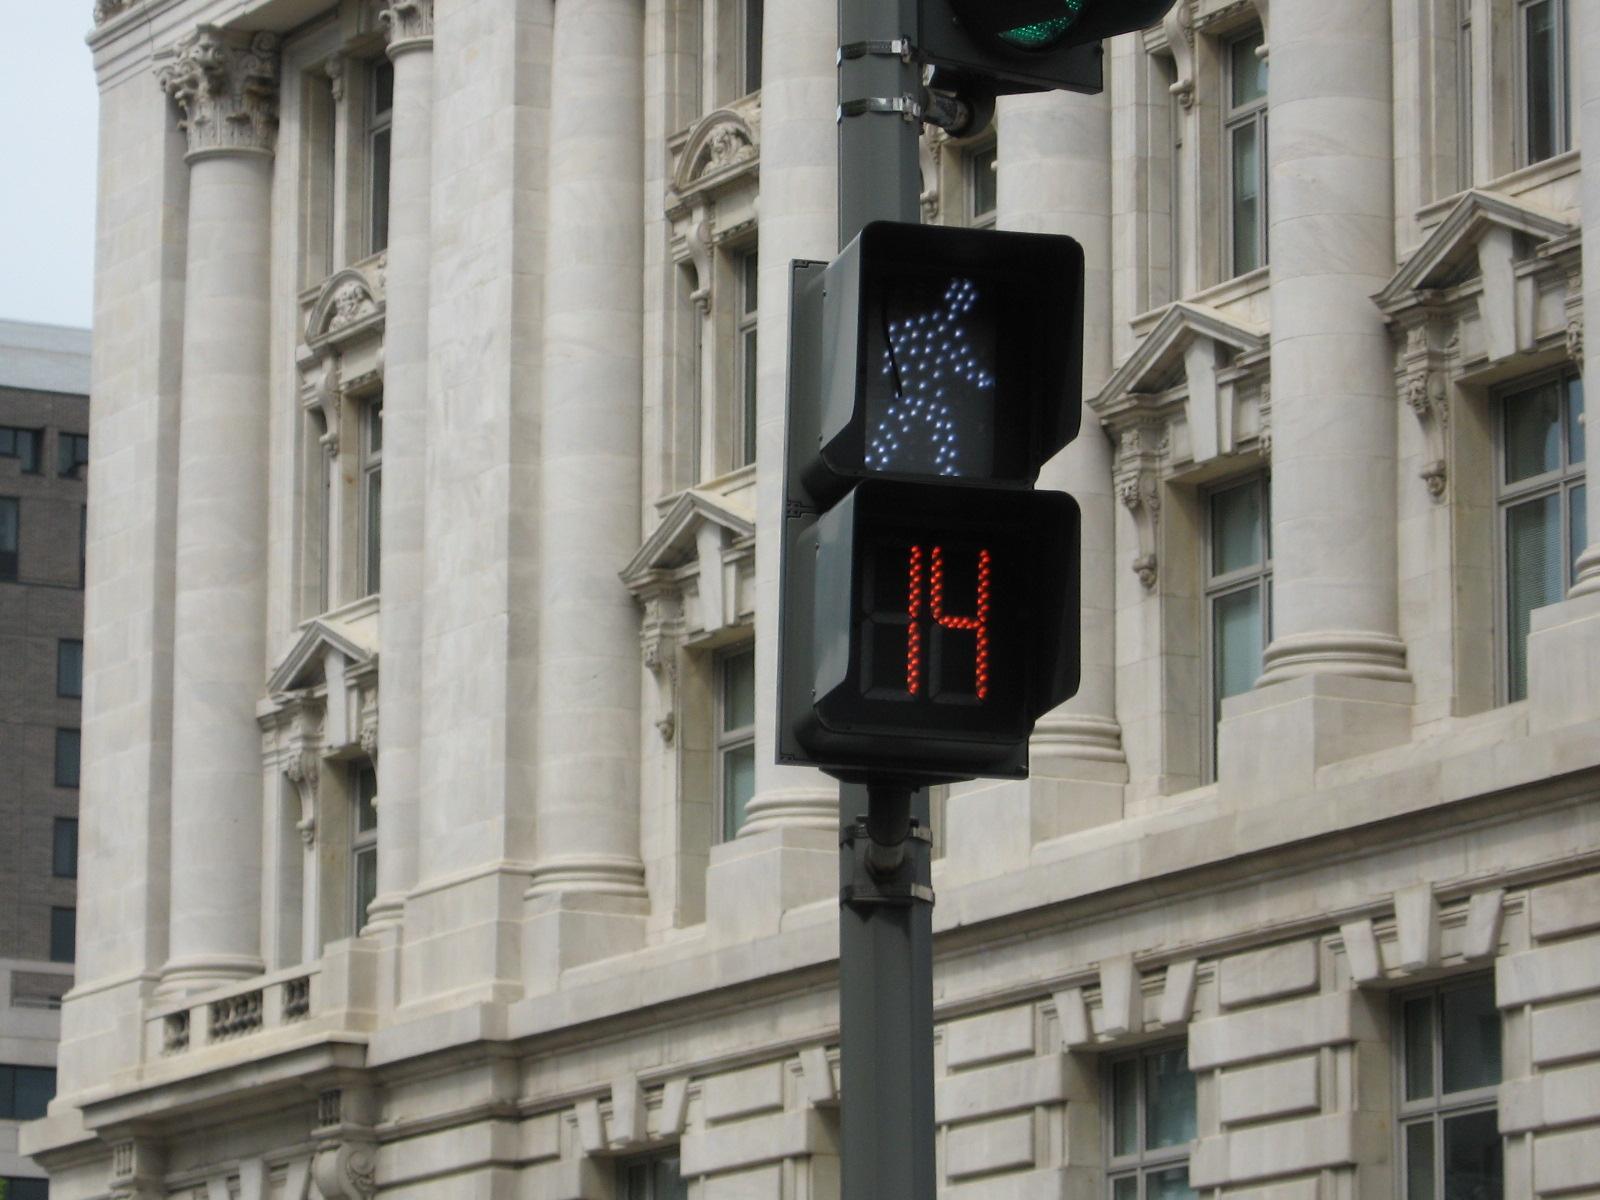 Pedestrian Countdown Signal (Wagner, PBIC)